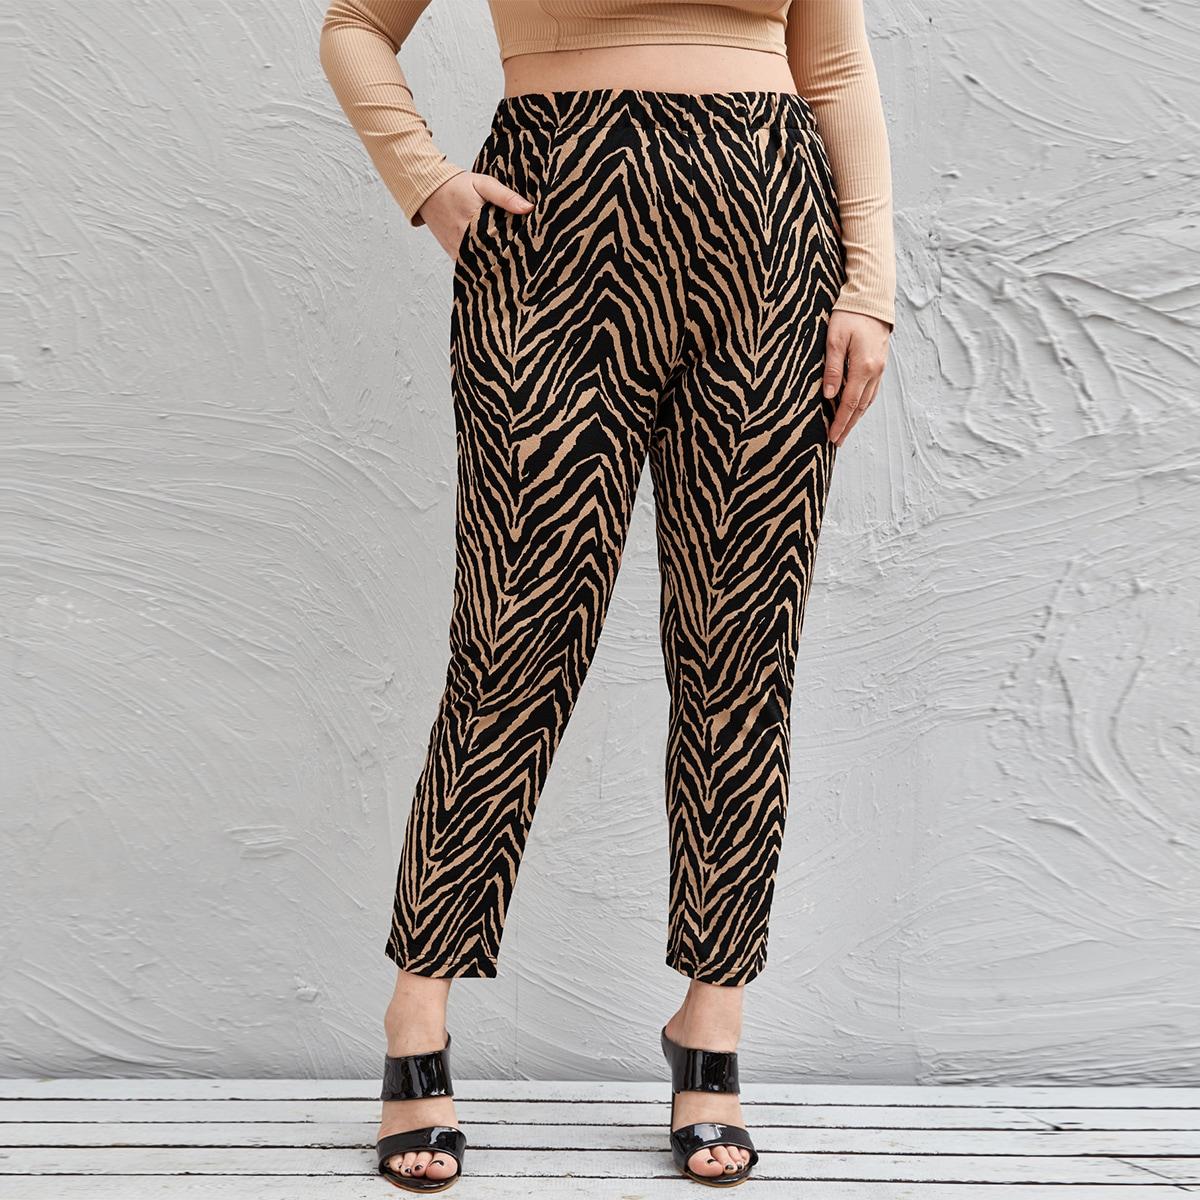 SHEIN Casual Zebra print Grote maten broeken Zak